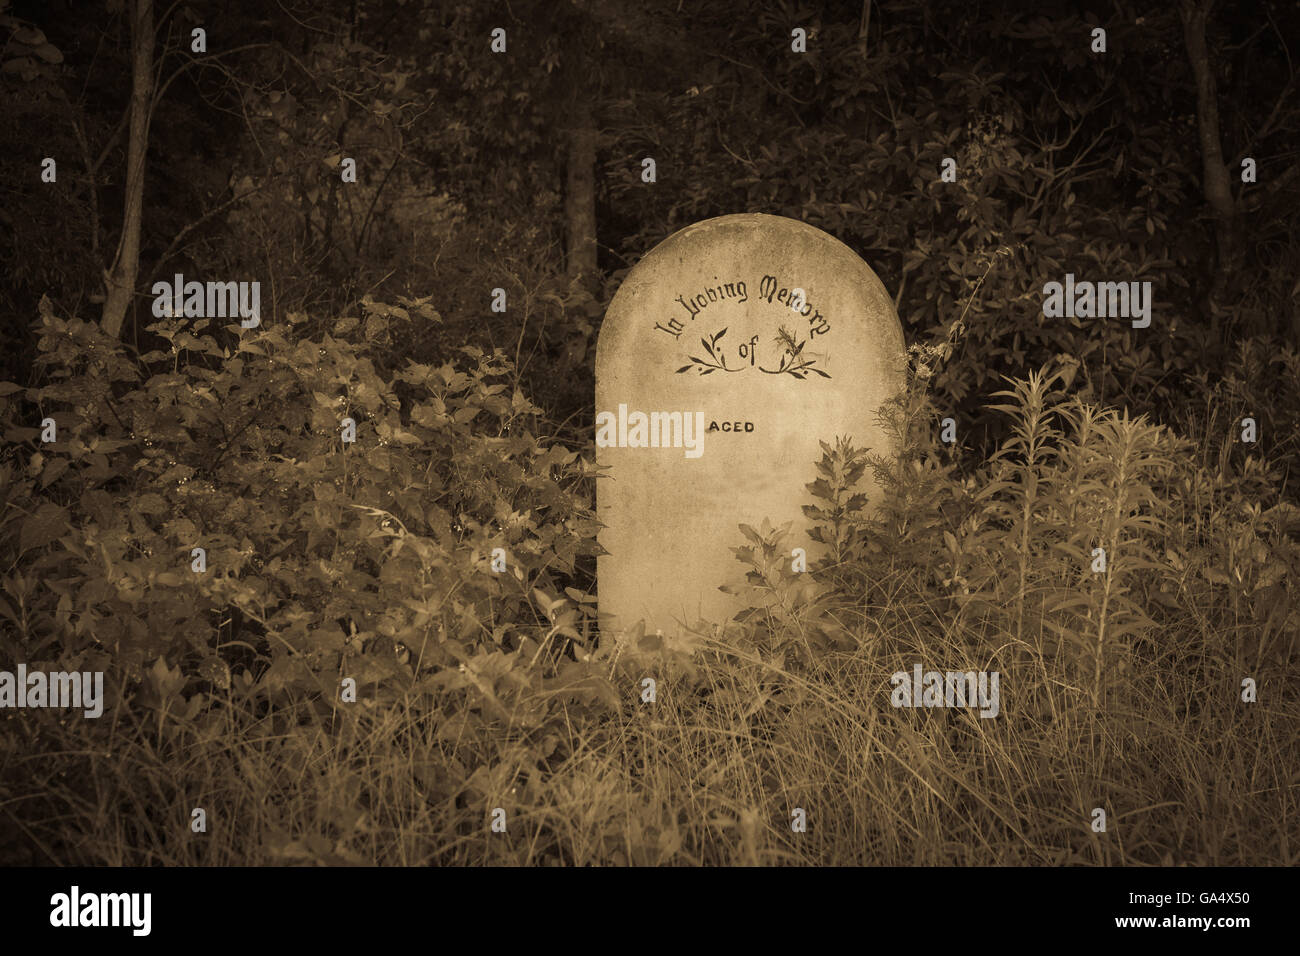 Single Concrete headstone contrasts in bush in old style sepia tones - Stock Image